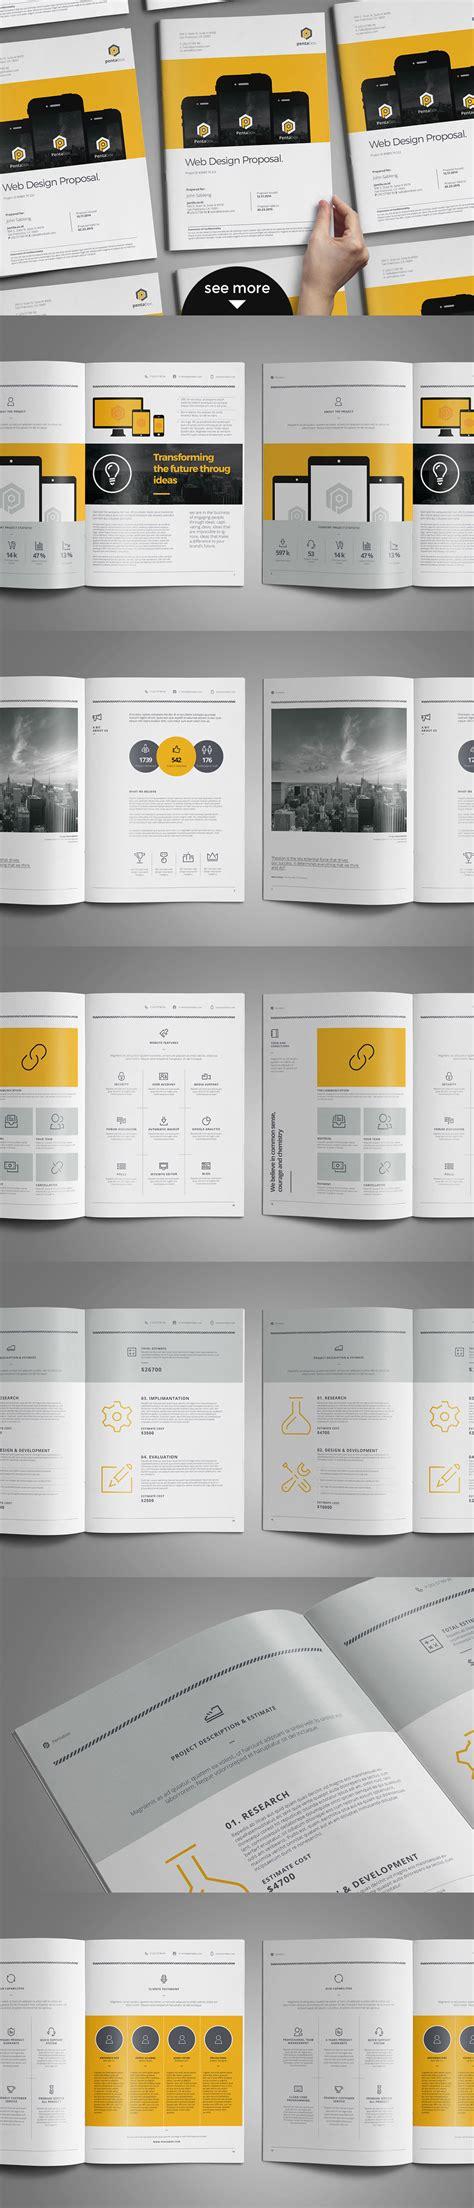 dr web design proposal vol what s hot bundle vol 2 presentation templates on behance